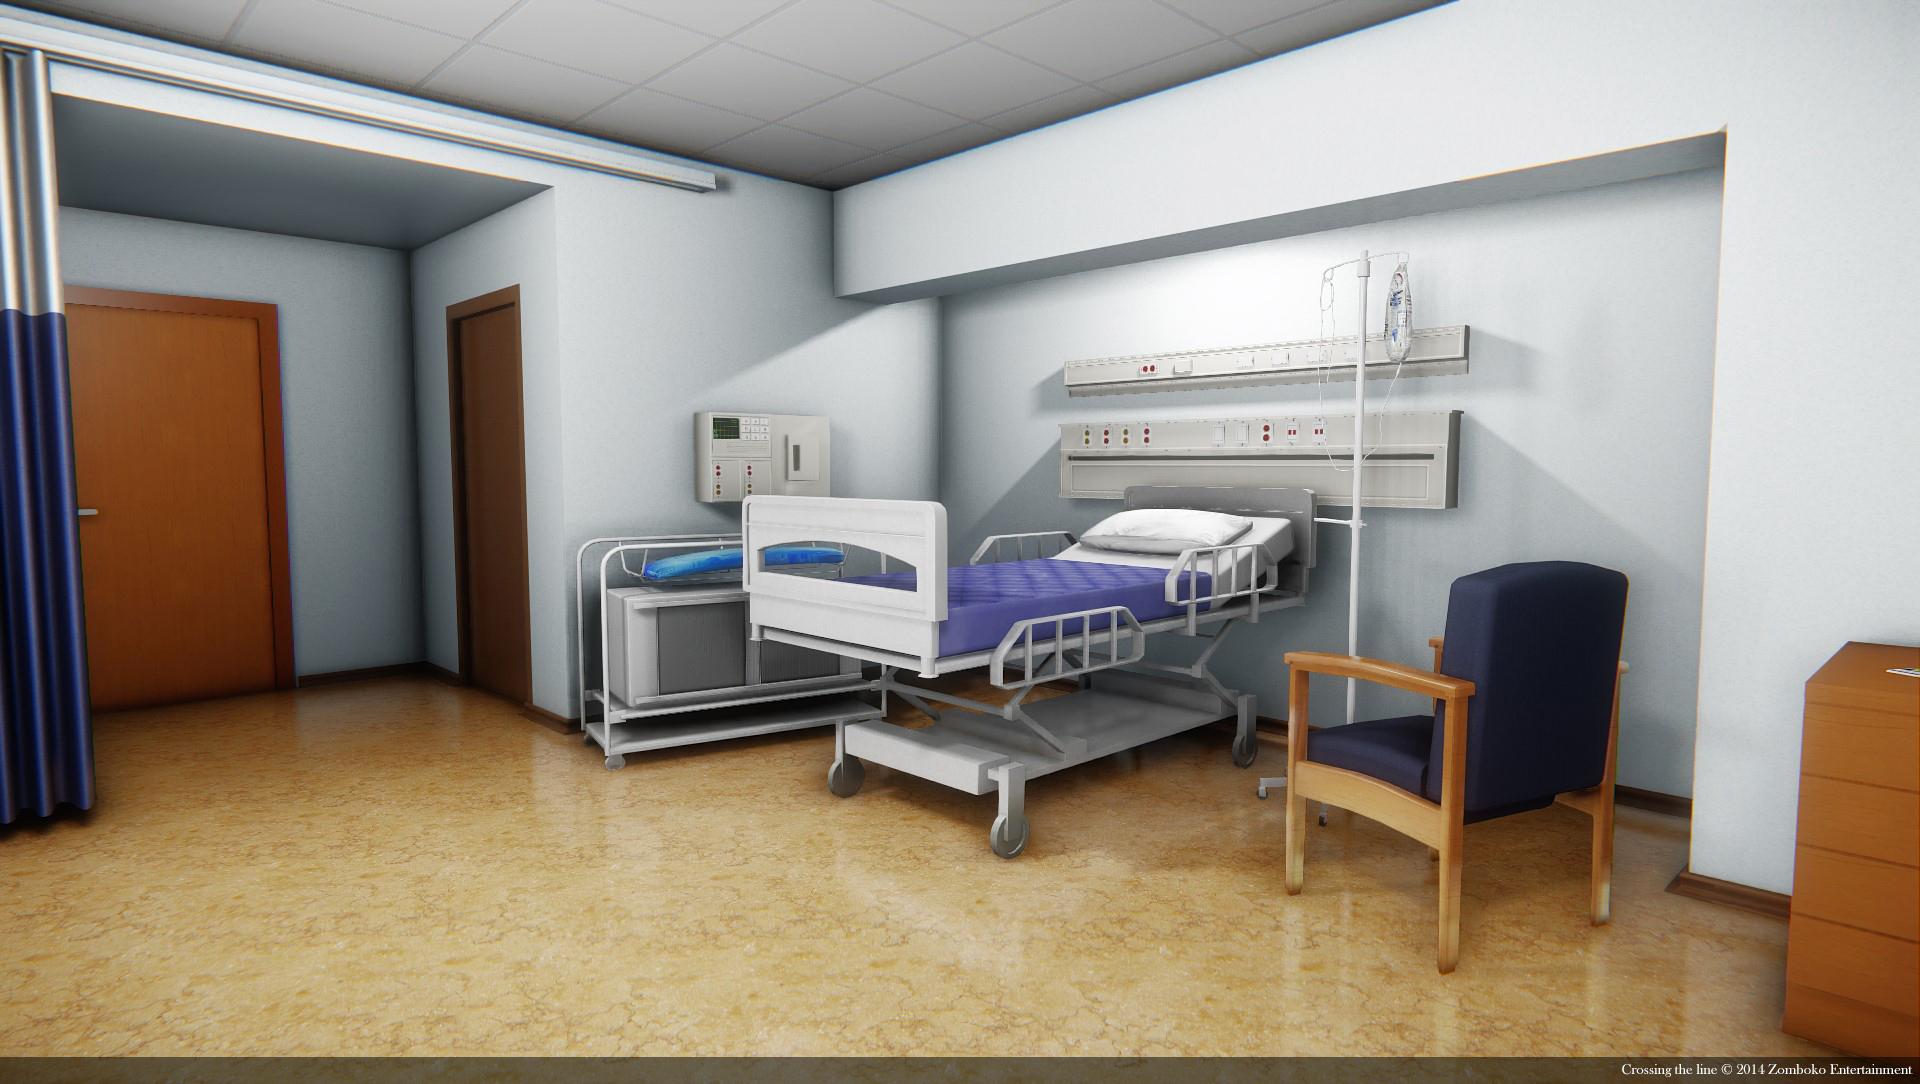 Hospital room image - Crossing the line - Mod DB